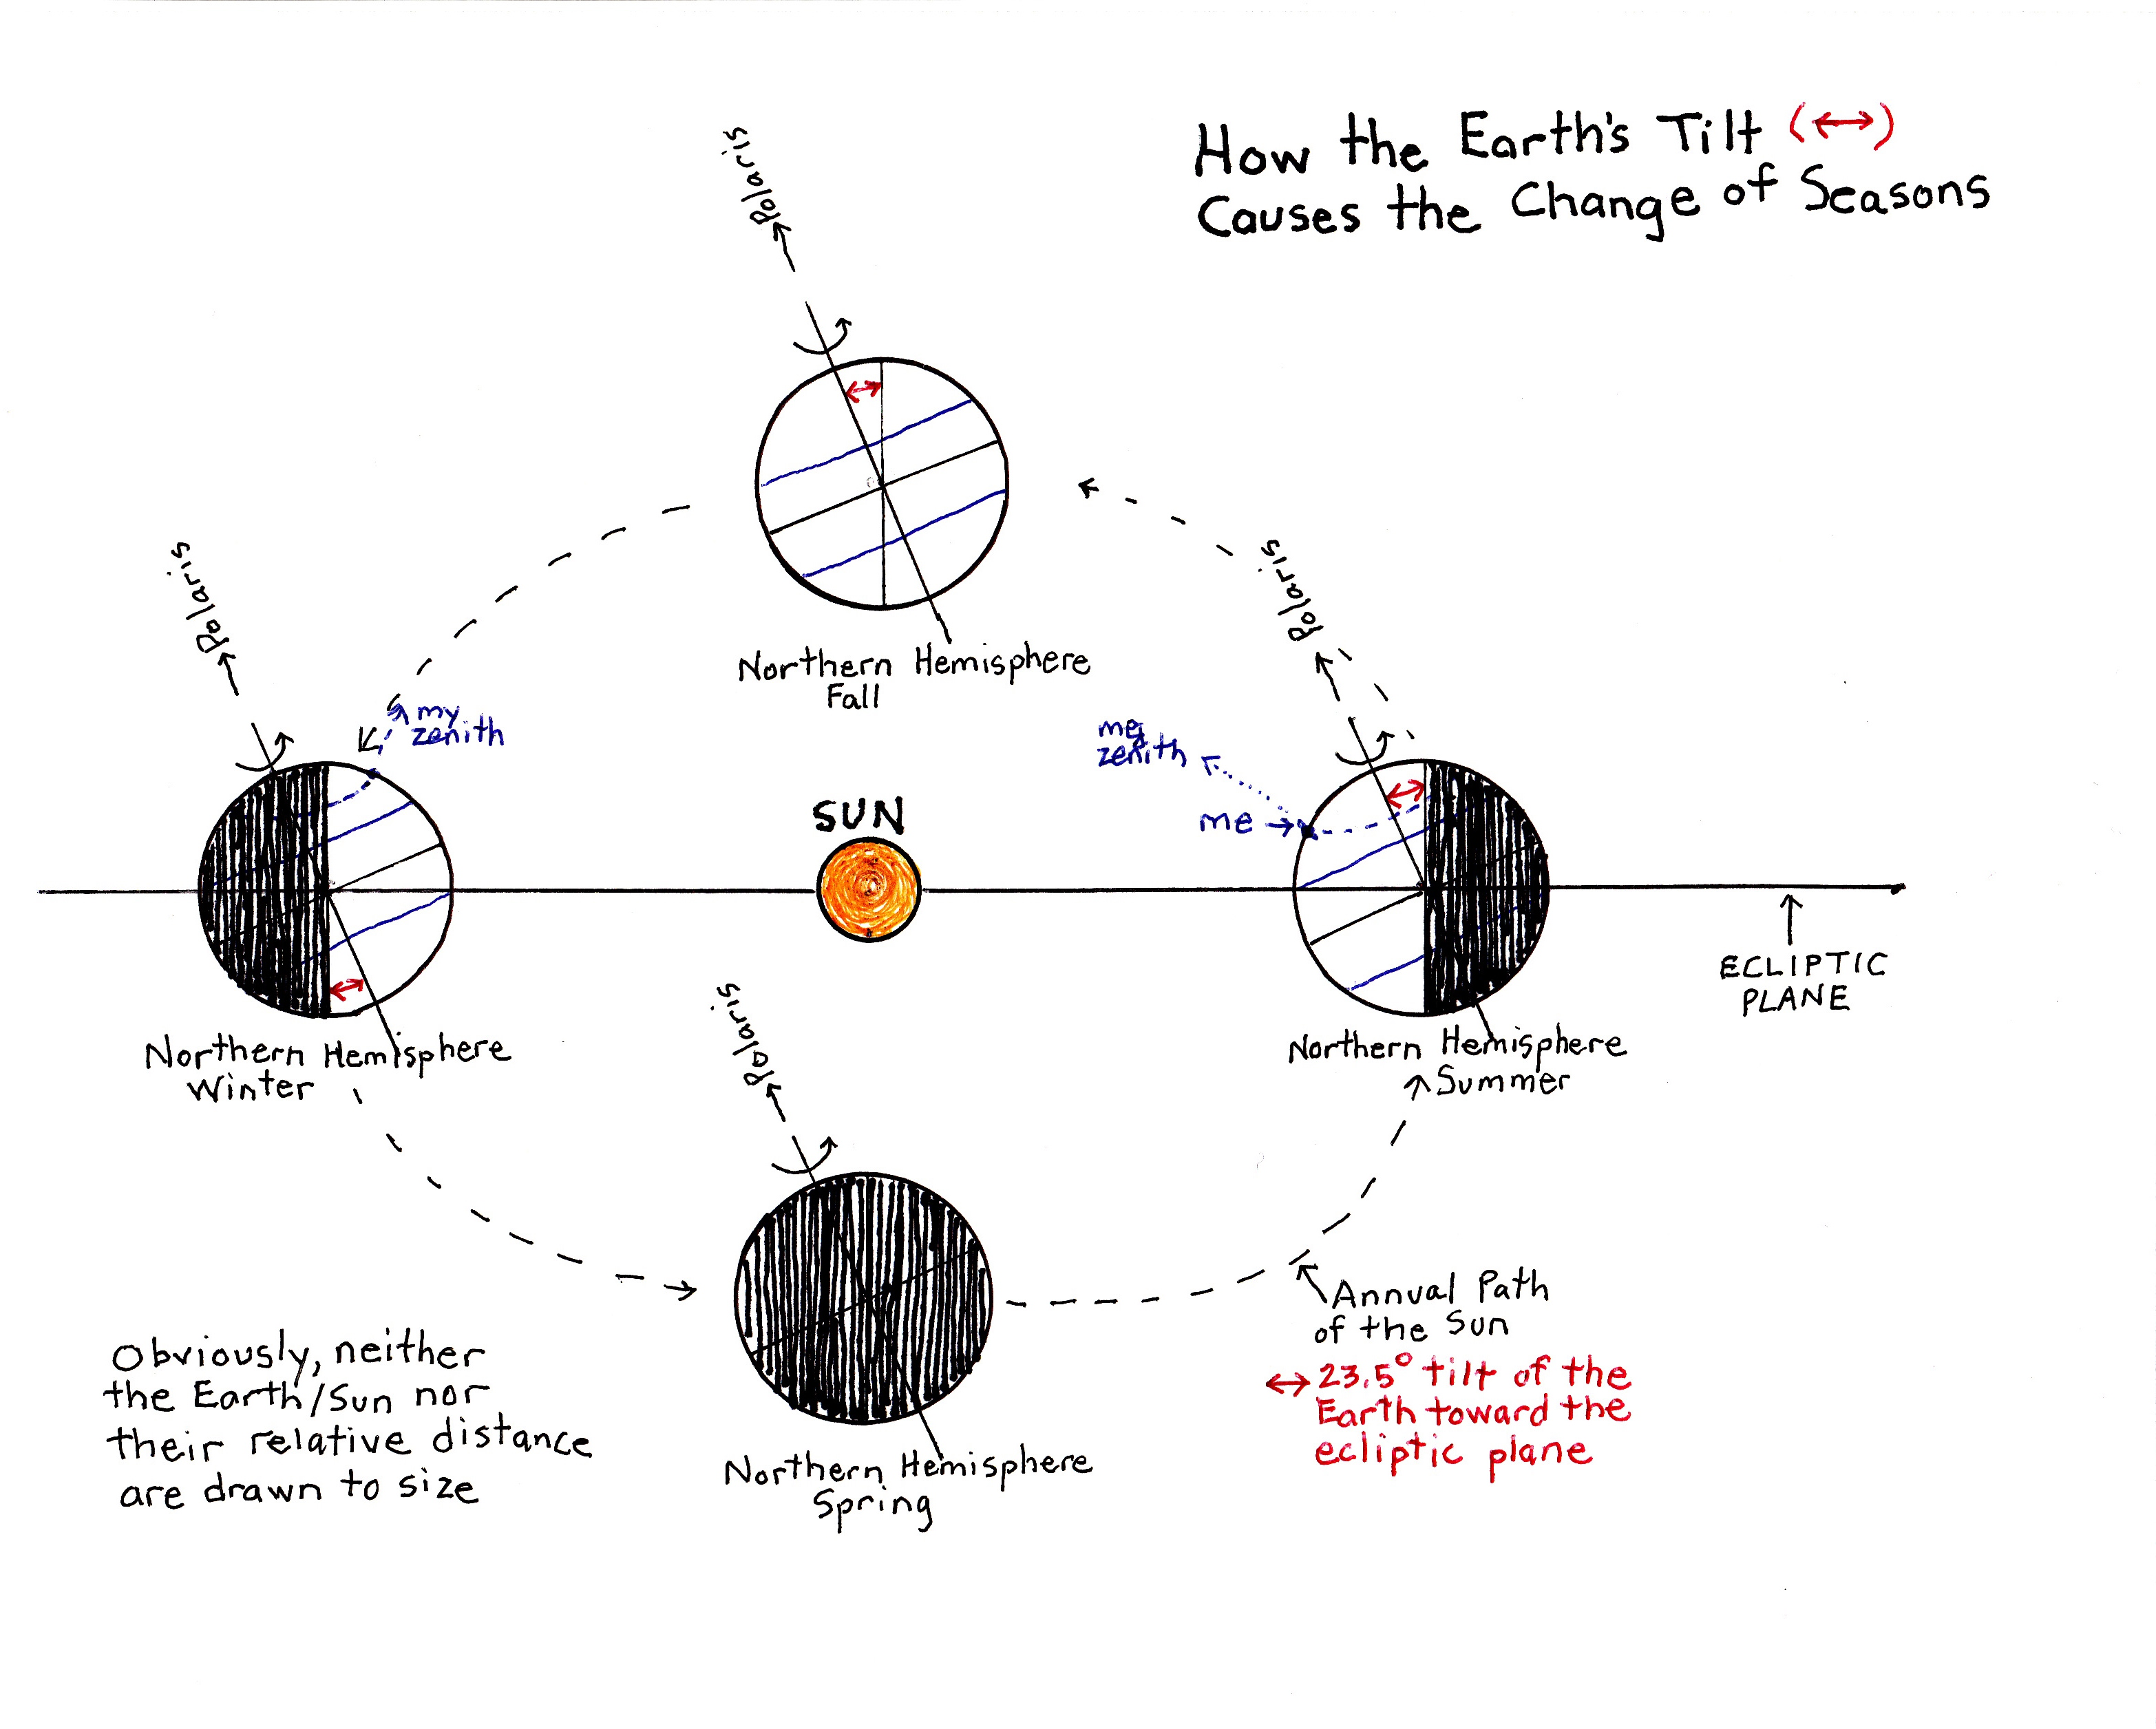 earth tilt and seasons diagram opel astra radio wiring the little dipper s rotation craig sense change of